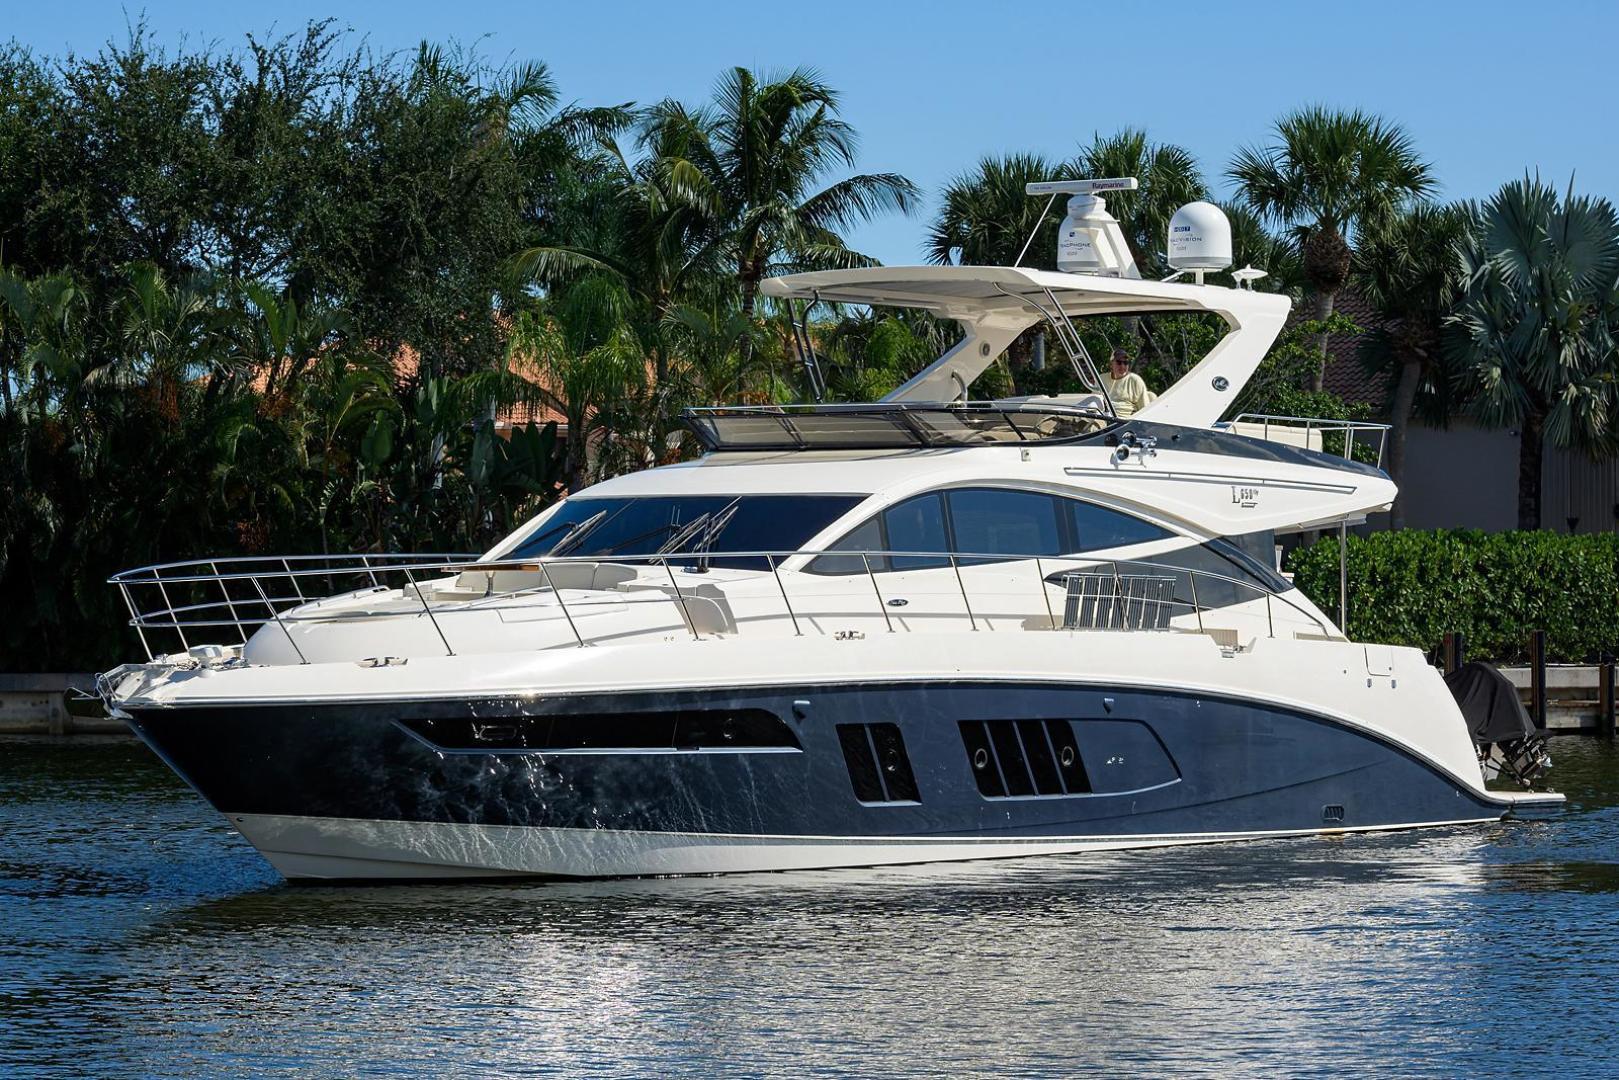 Sea Ray-L650 Fly 2015-KNOT ON CALL Juno Beach-Florida-United States-1476283 | Thumbnail